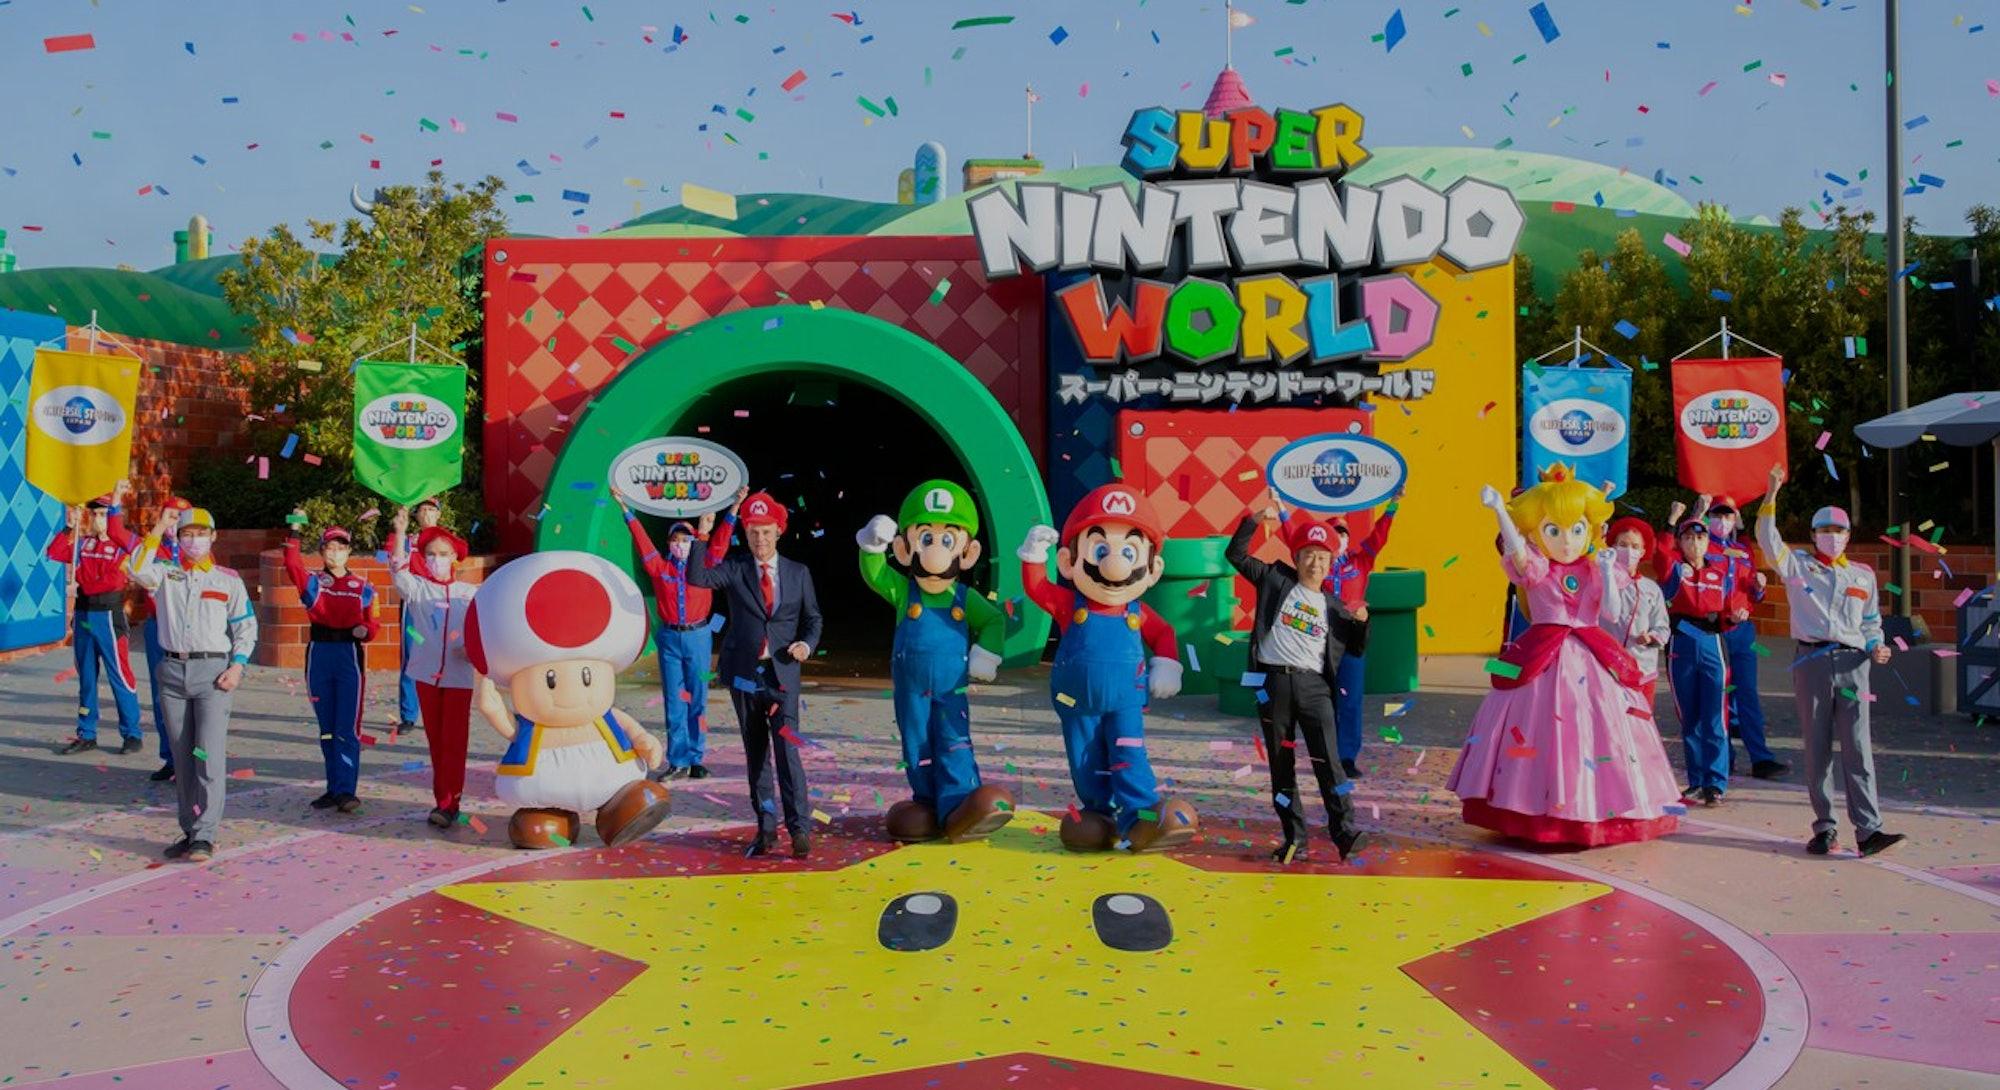 Super Nintendo World grand opening in Osaka Japan. Super Mario. Nintendo.